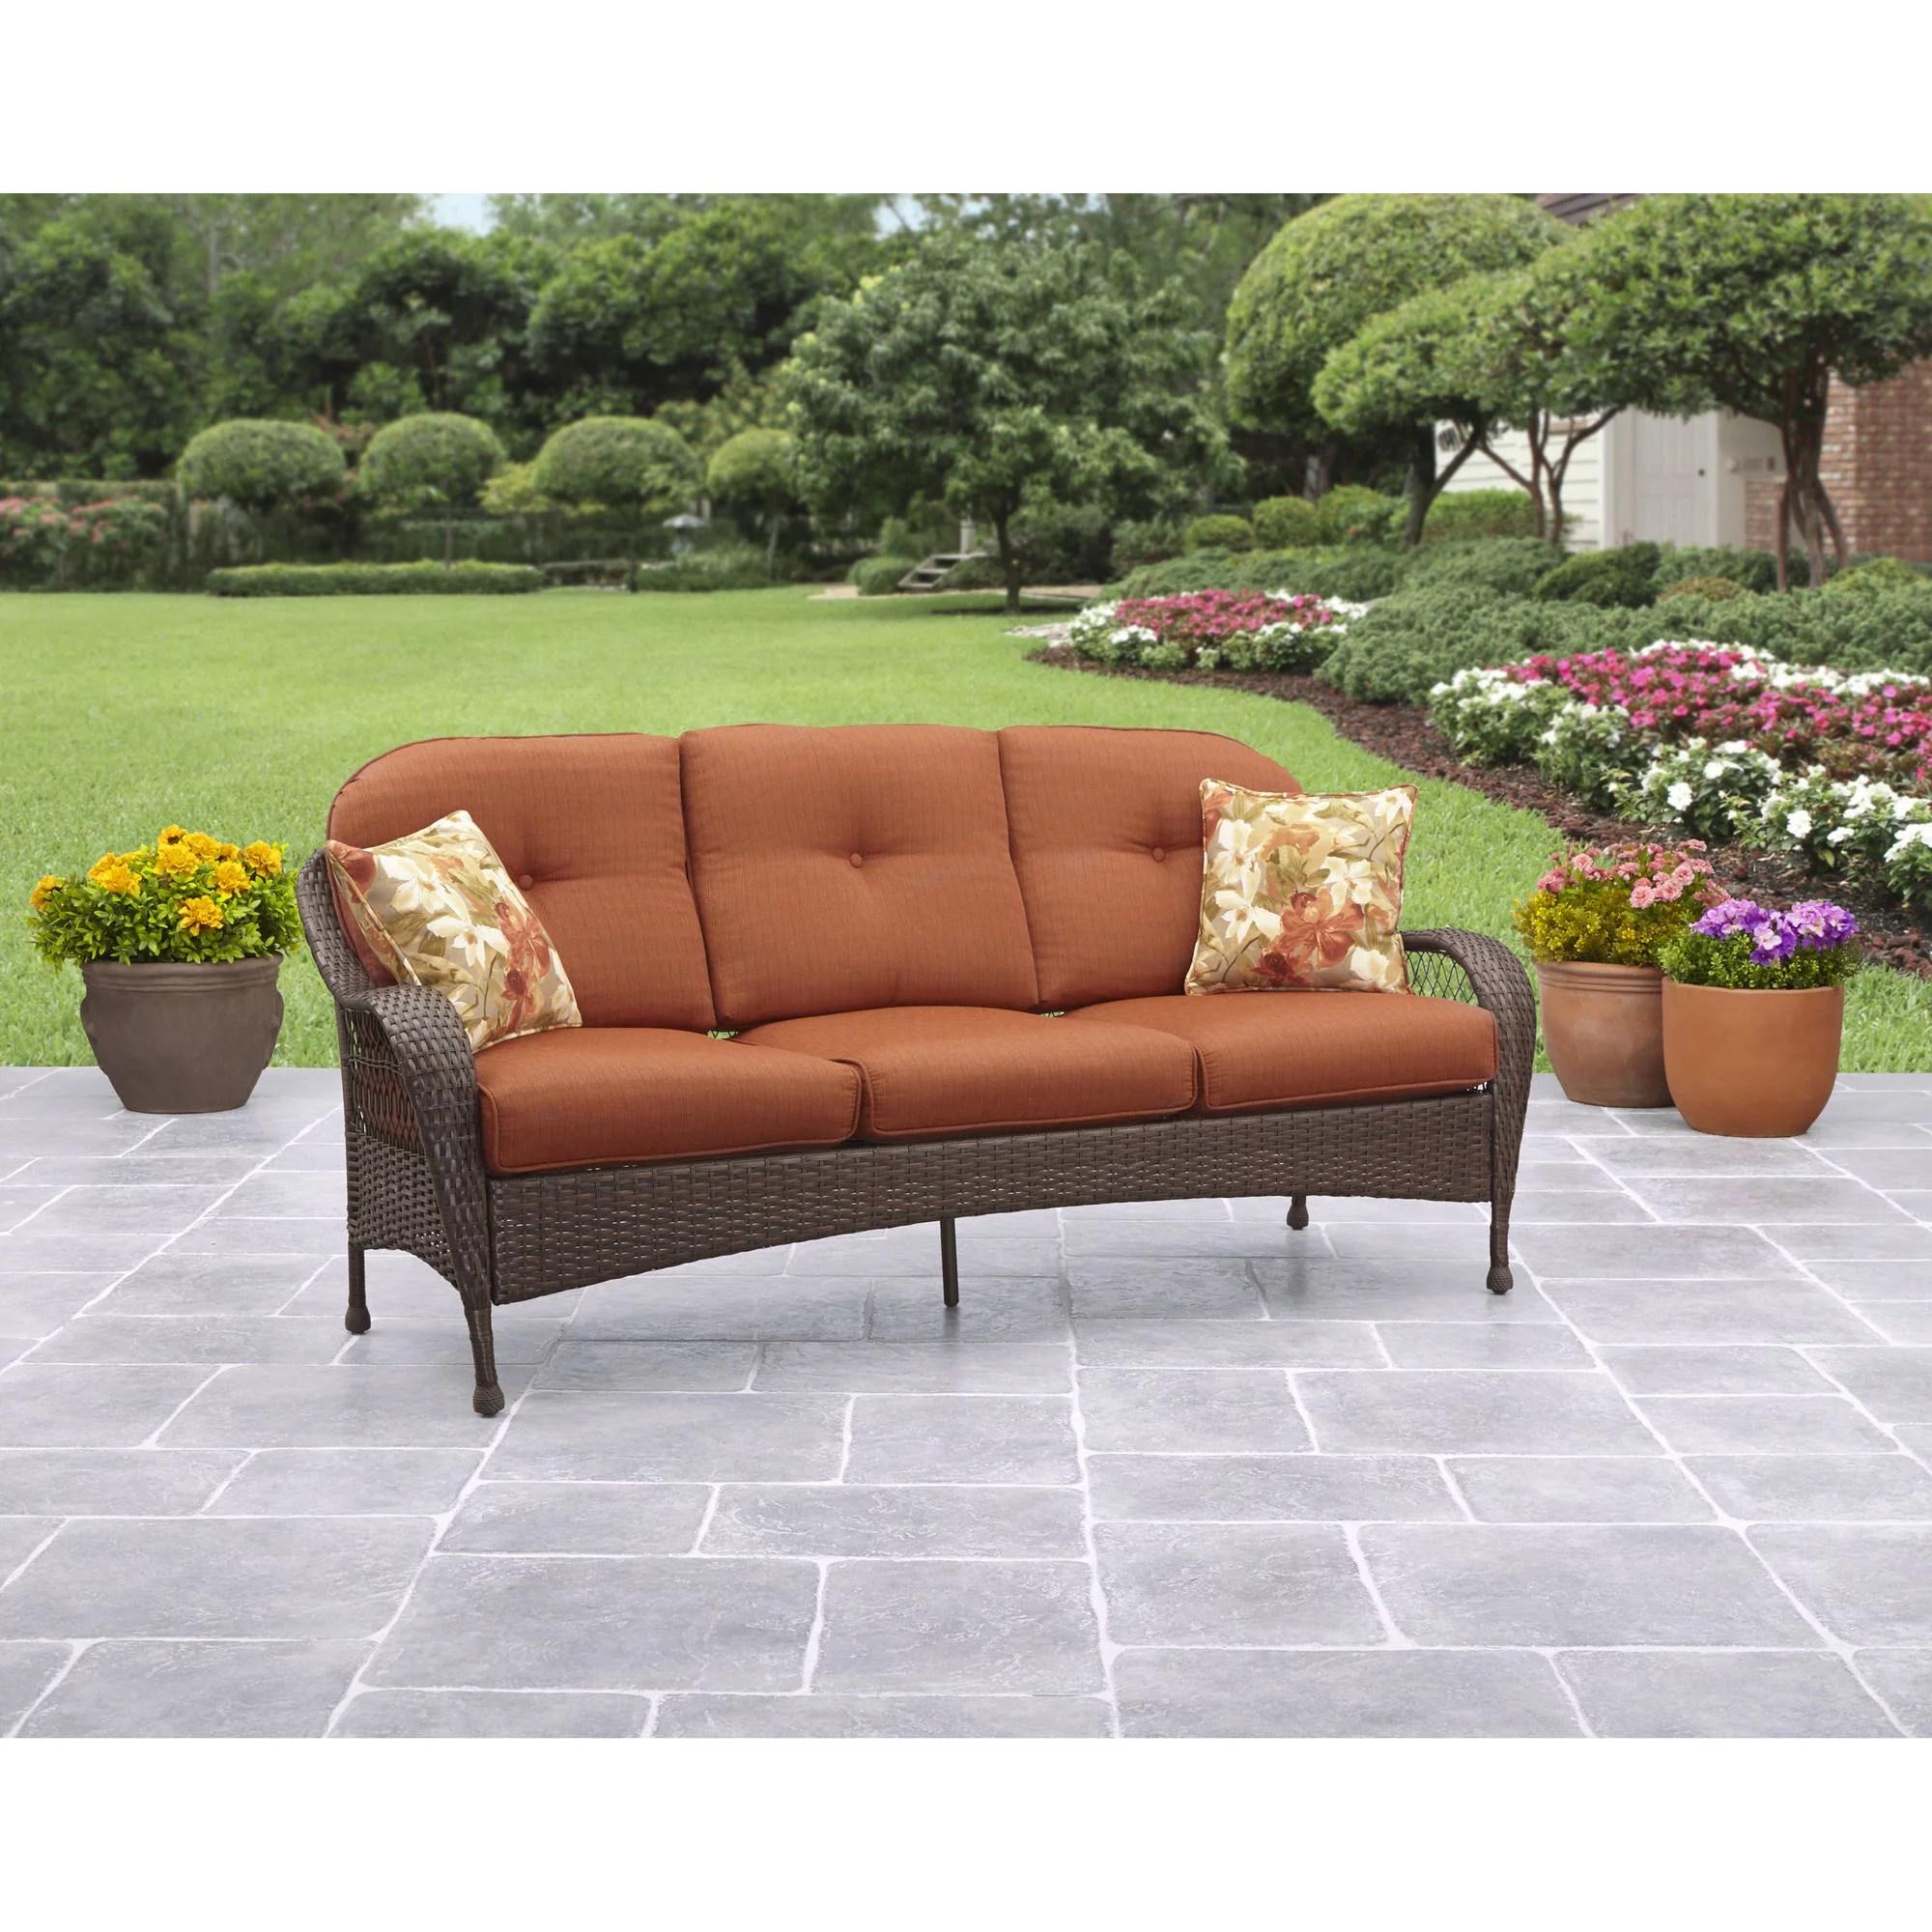 Better Homes And Gardens Azalea Ridge Outdoor Sofa Seats